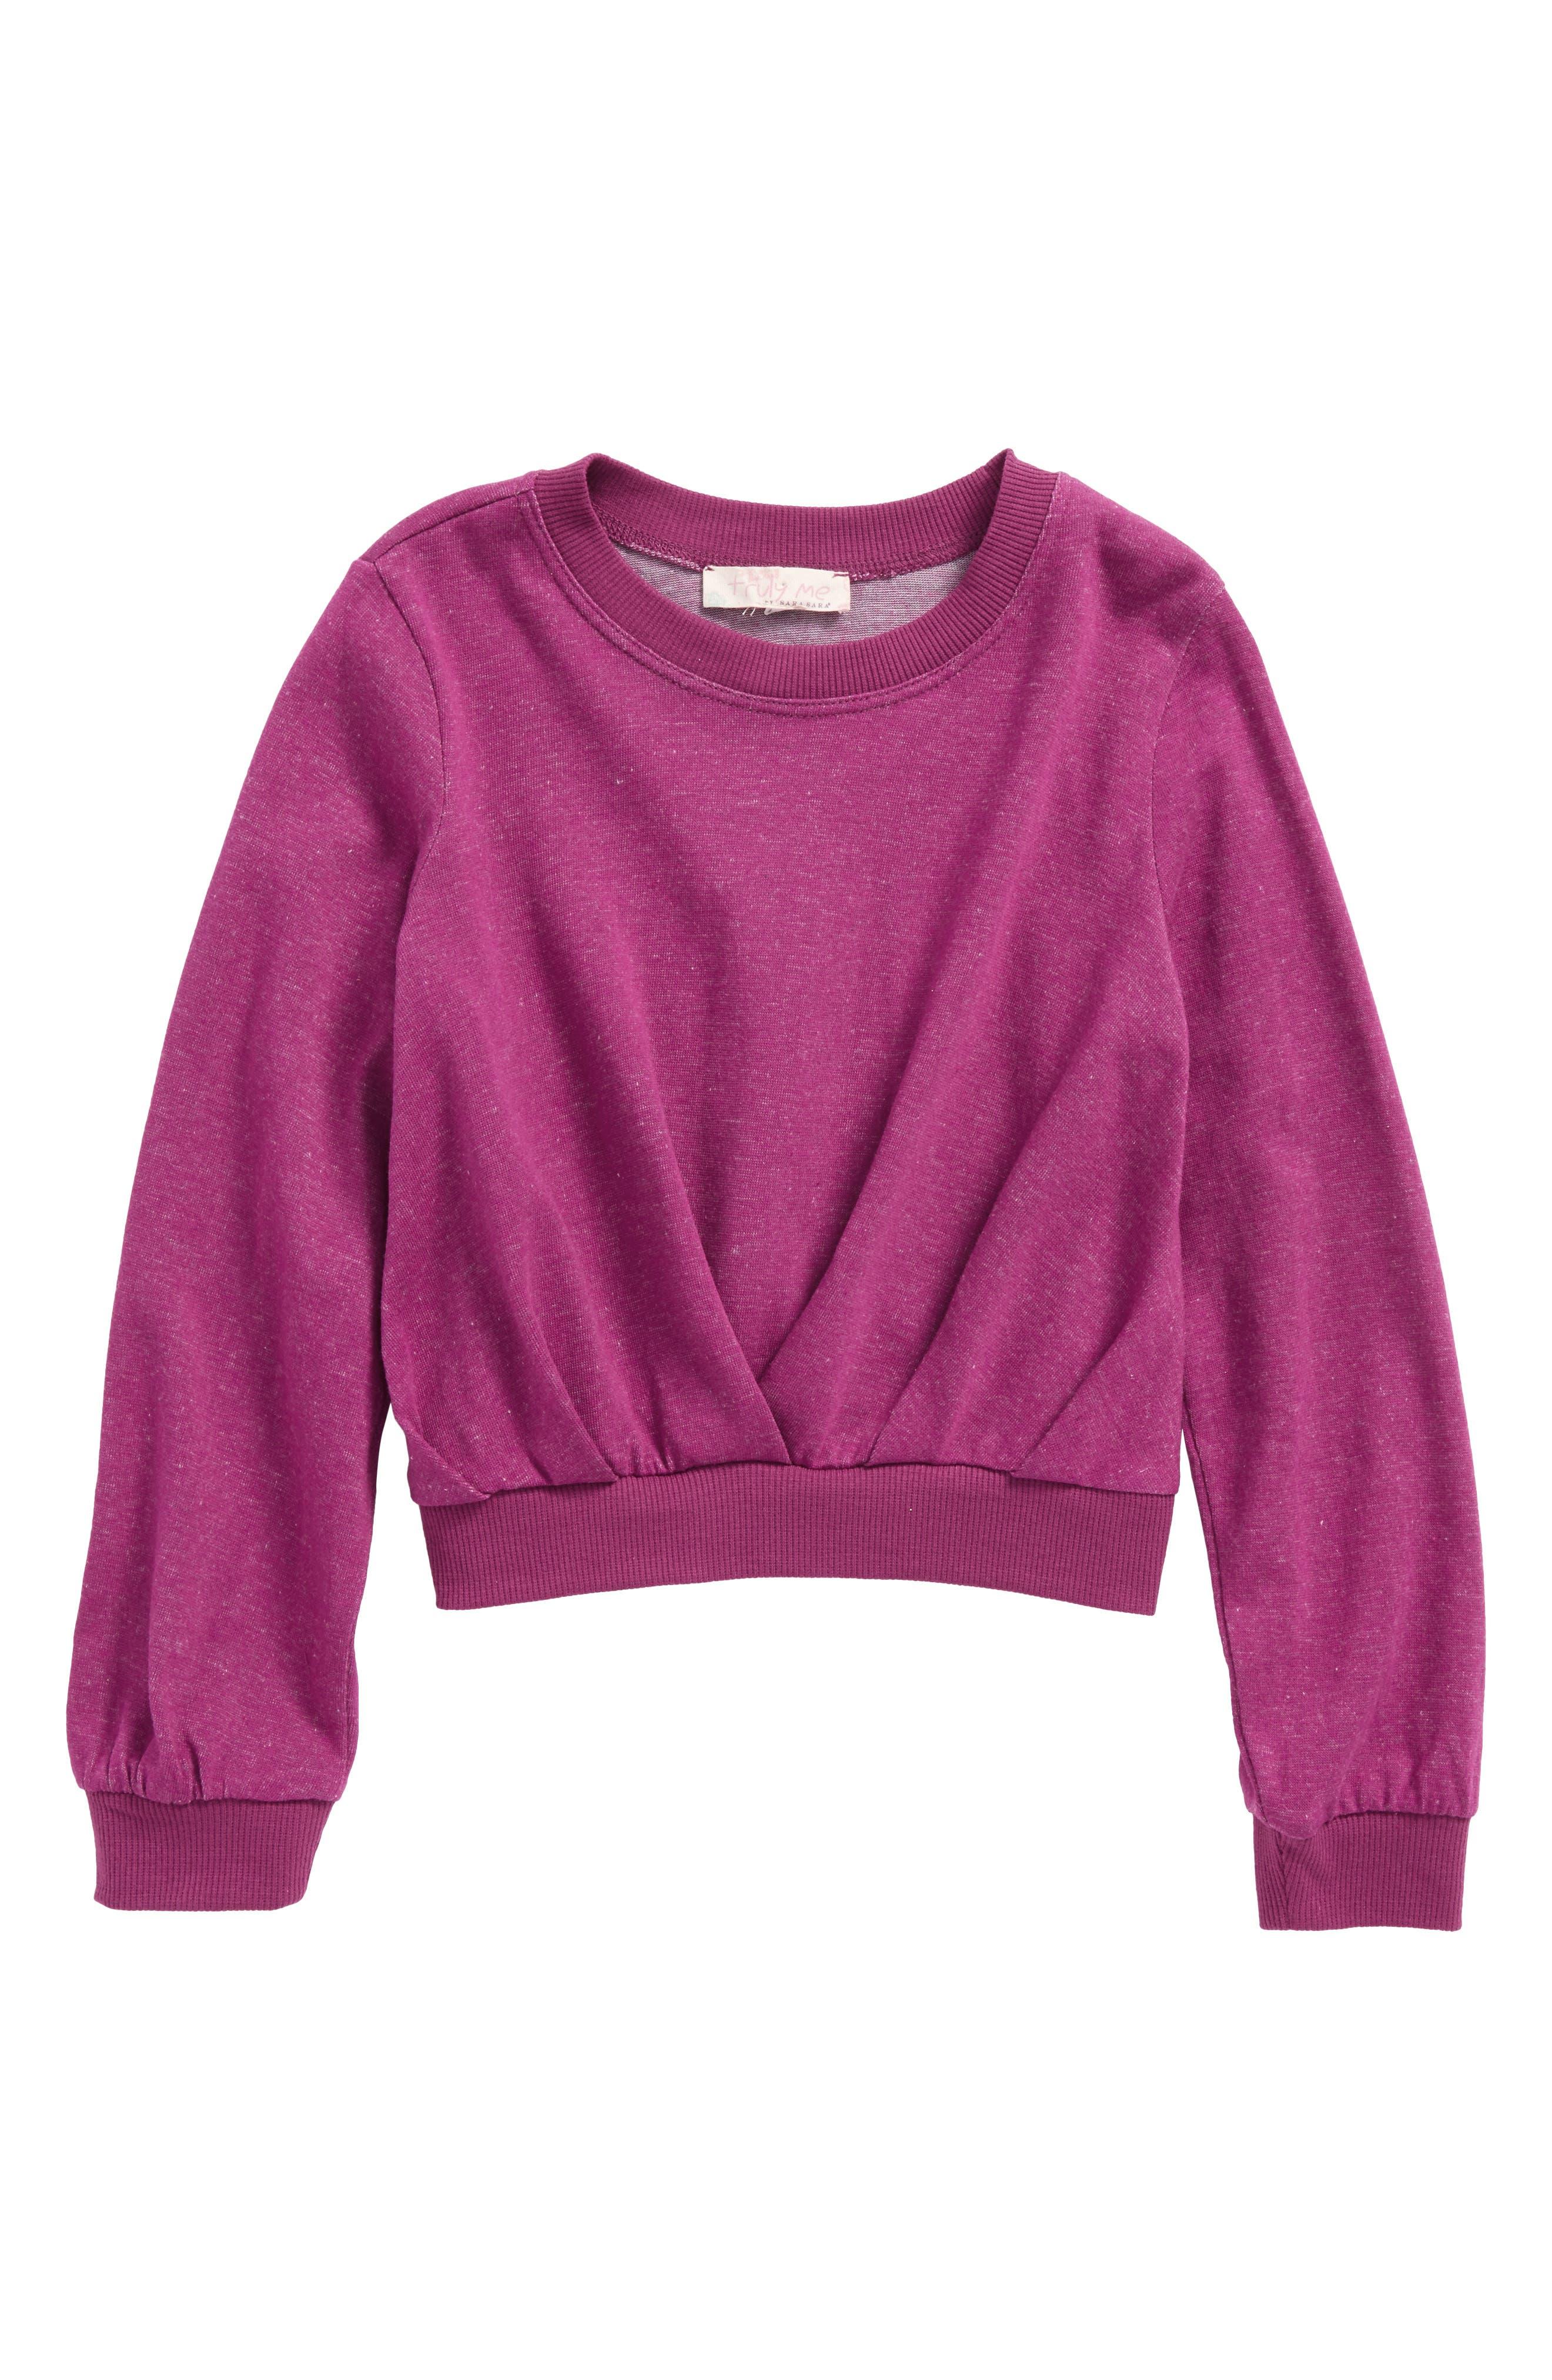 Truly Me Pleated Sweatshirt (Toddler Girls & Little Girls)